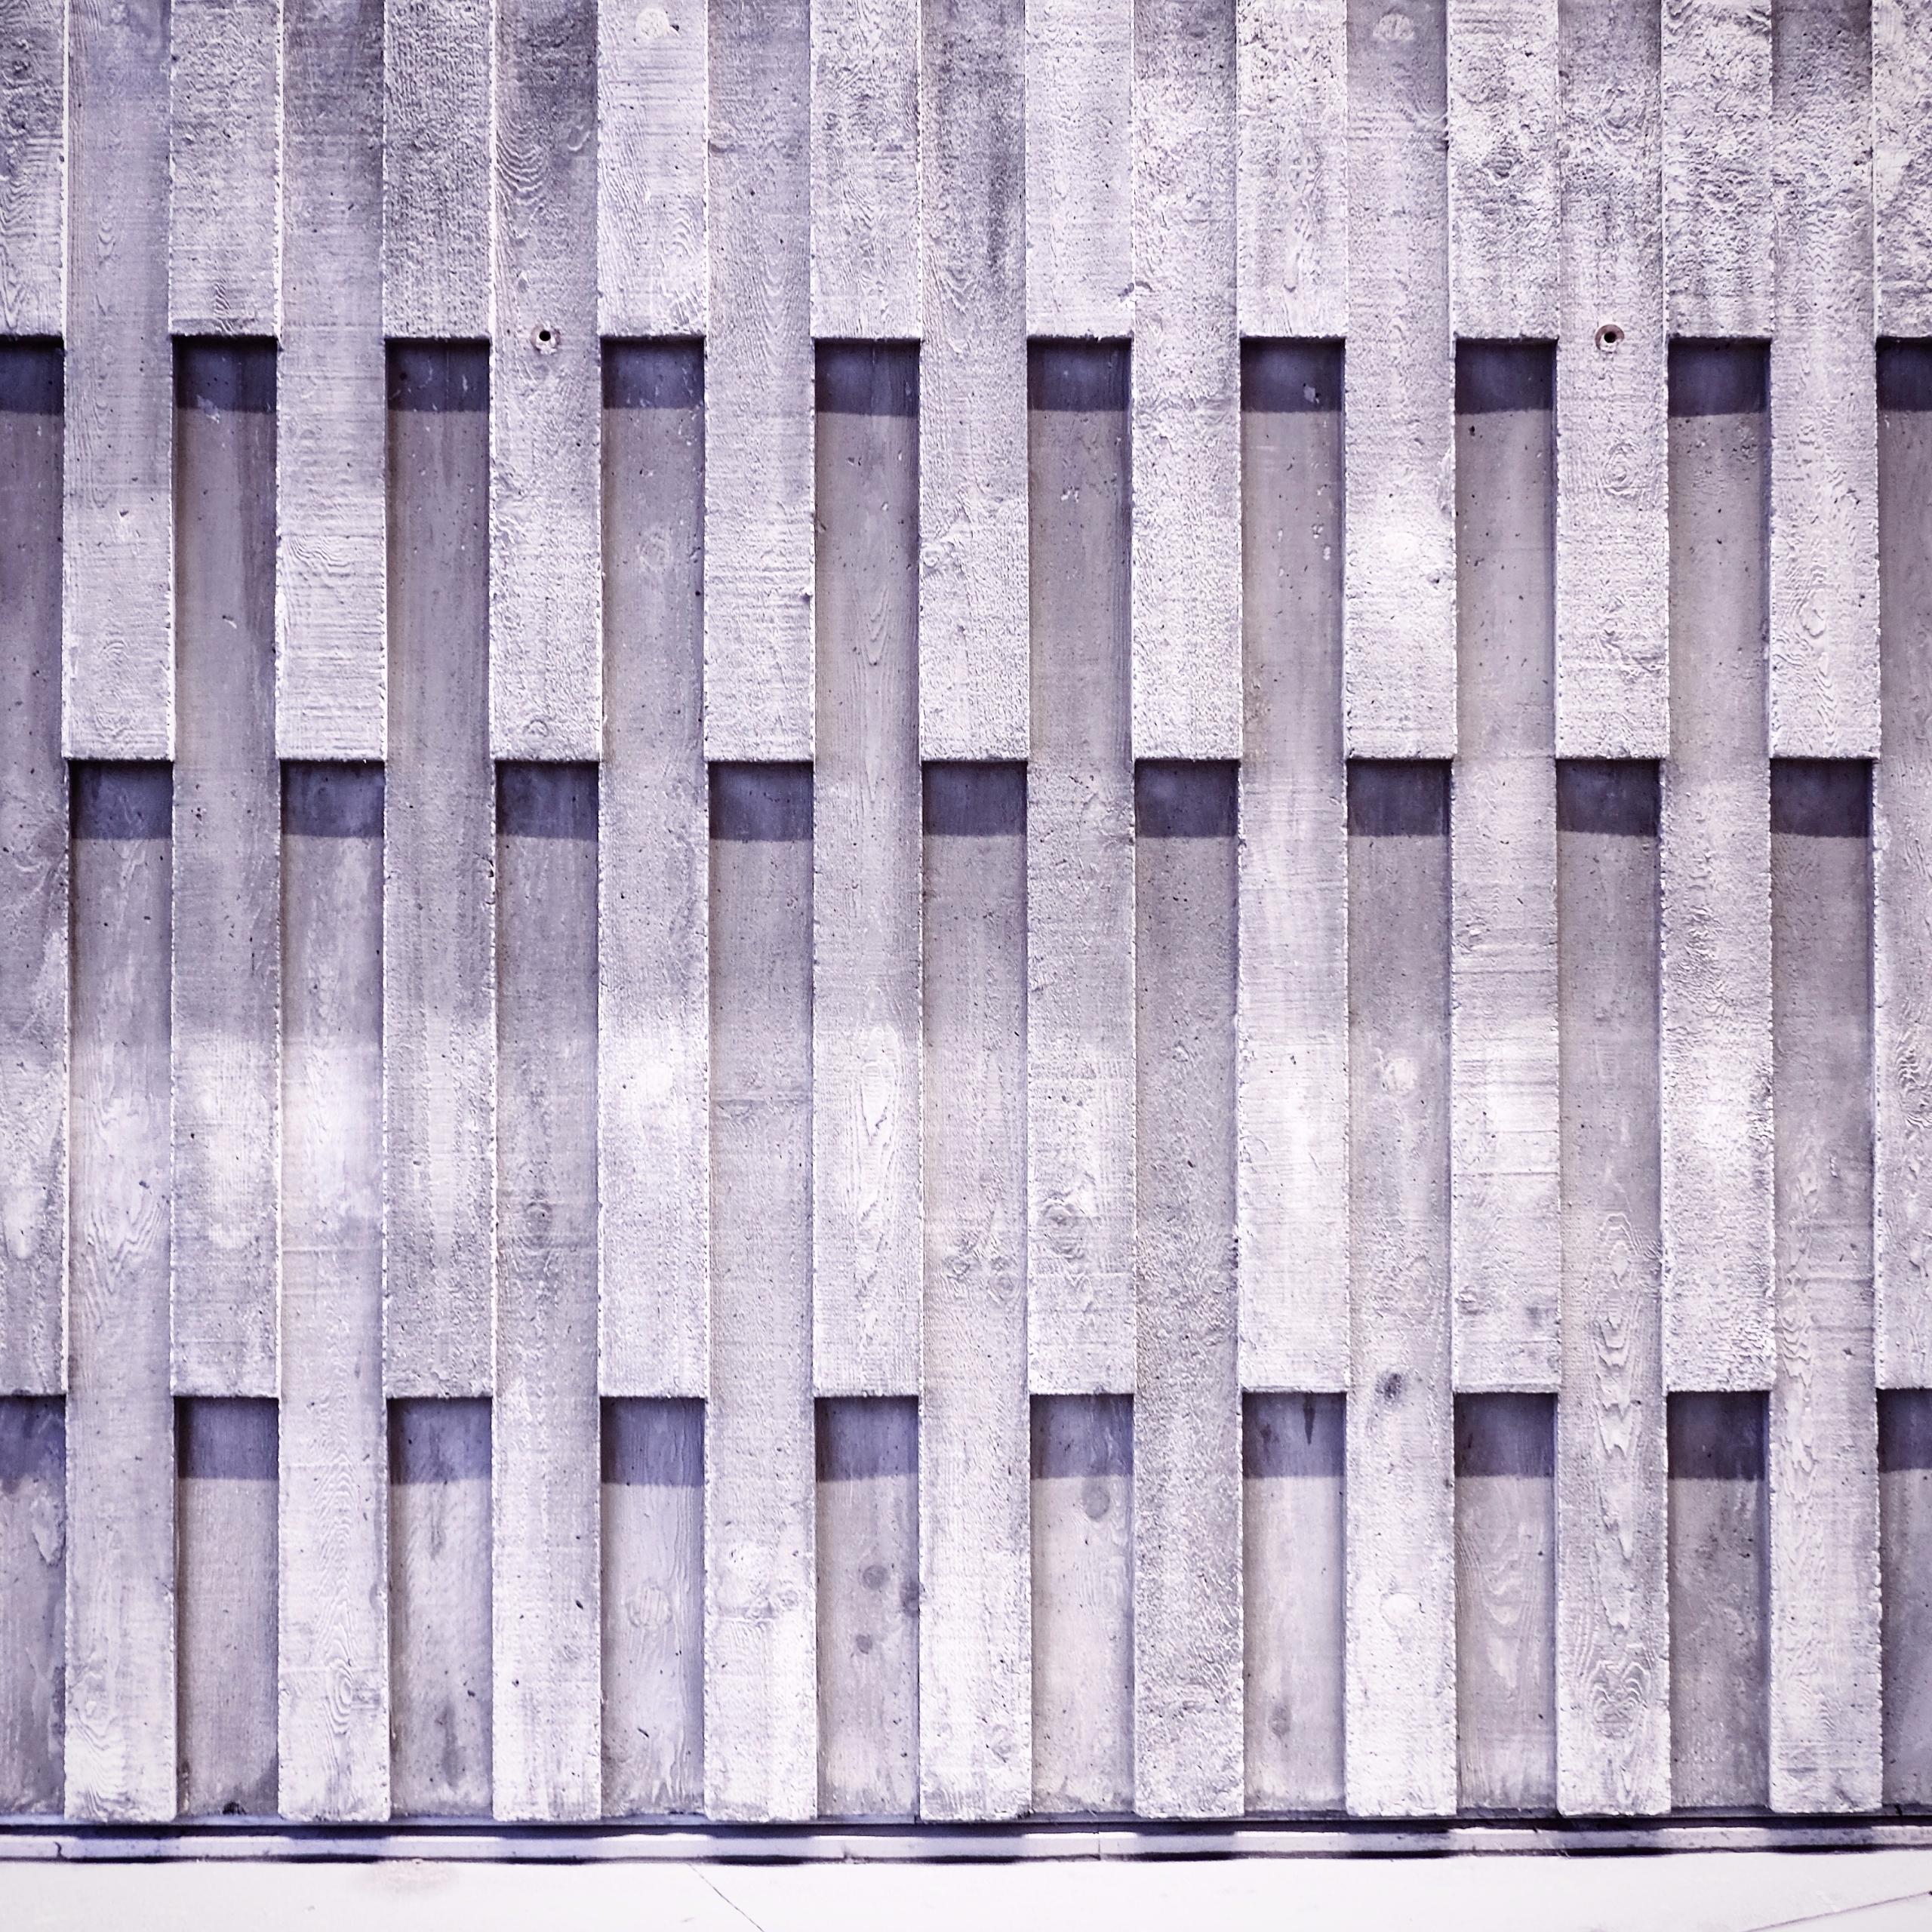 Concrete pattern. Clever, timel - danhogman | ello